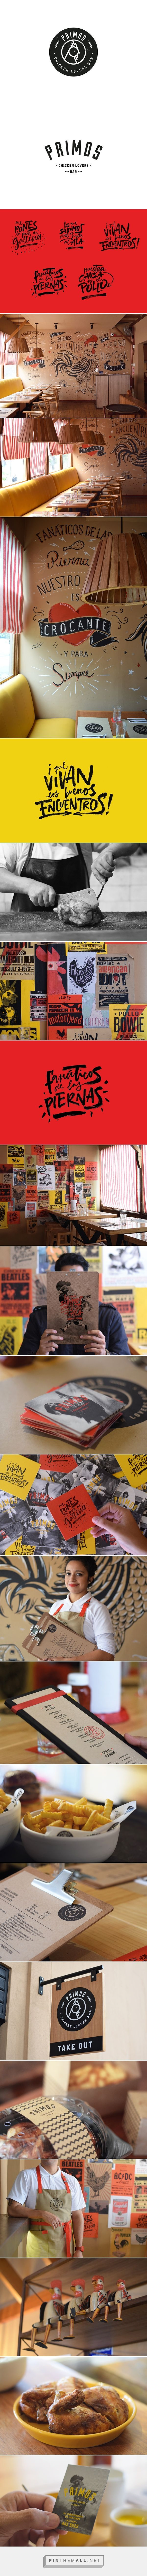 Primos Chicken Lovers Bar Branding and Restaurant Menu Design by Paloma Nieri | Fivestar Branding Agency – Design and Branding Agency & Curated Inspiration Gallery